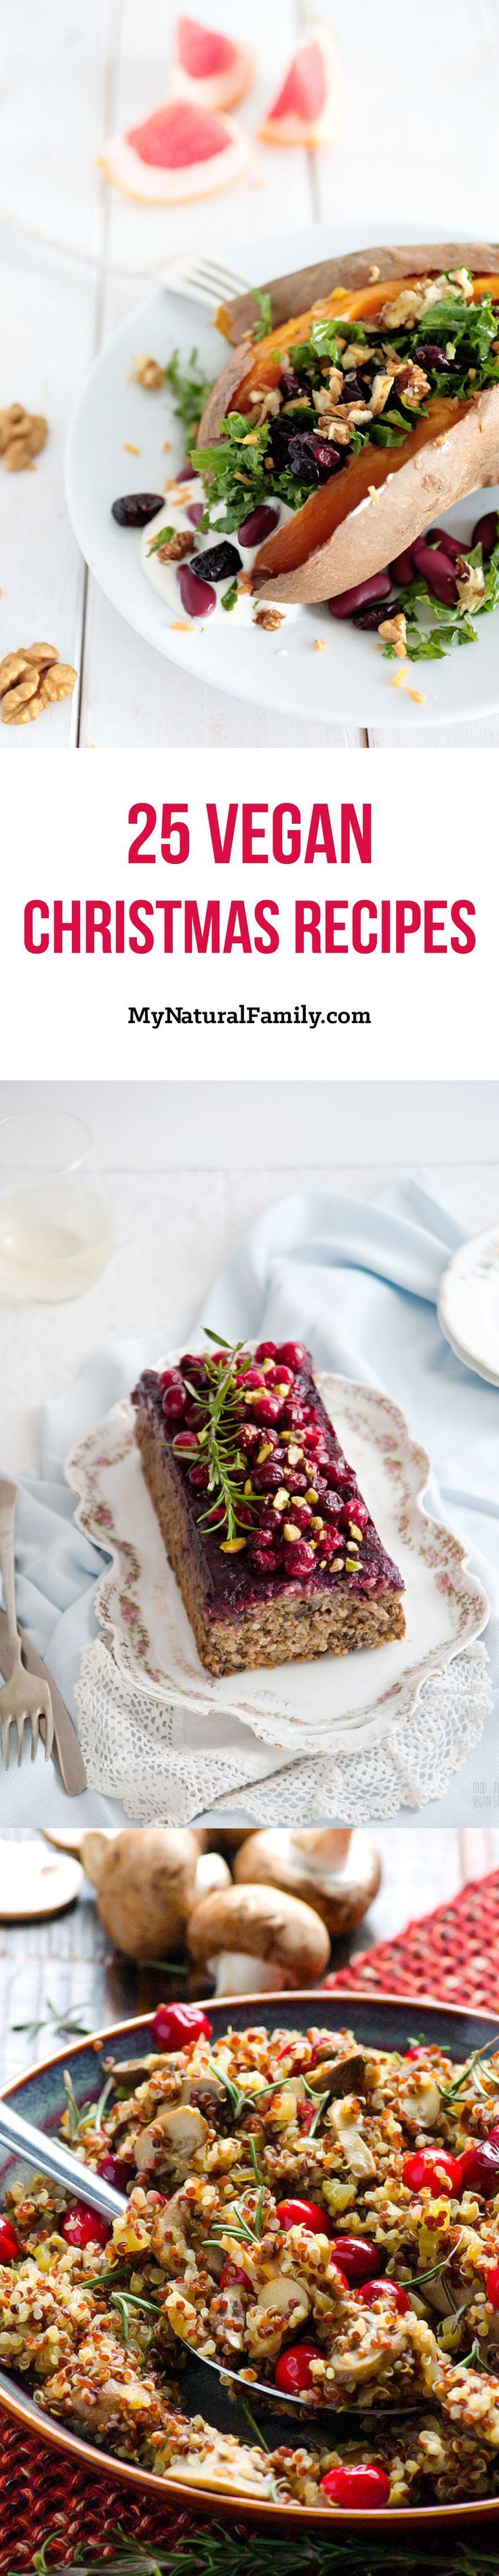 25 Vegan Christmas Recipes - you'll love the Vegan dressing, Vegan desserts, Vegan nutroast recipe to a Vegan fudge recipe and everything in between.